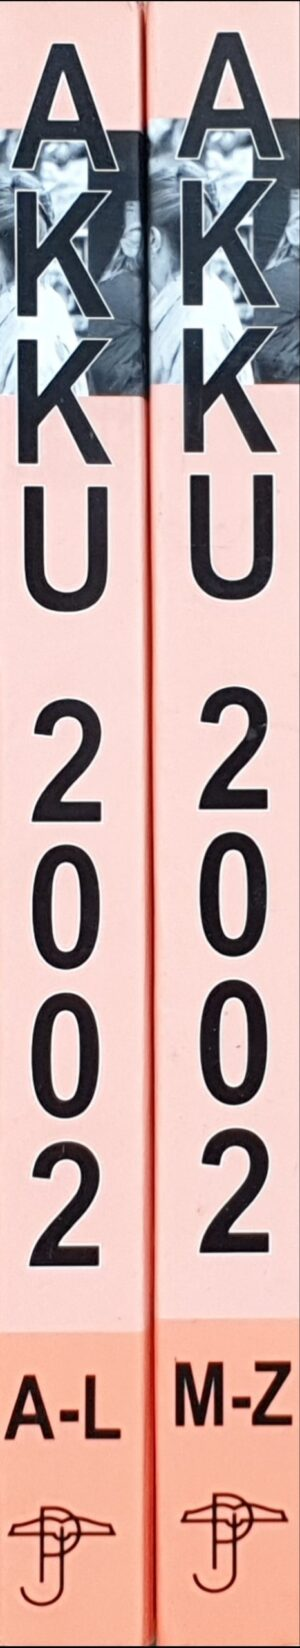 AKKU 2002 lexicon 90-805707-2-9 naslagwerk biografisch handboek 9080570729 kunstschilders skoander.com informatie kunstenaars lexixon lexikon artlexicon artlexica lexica kunst schilderslexicon